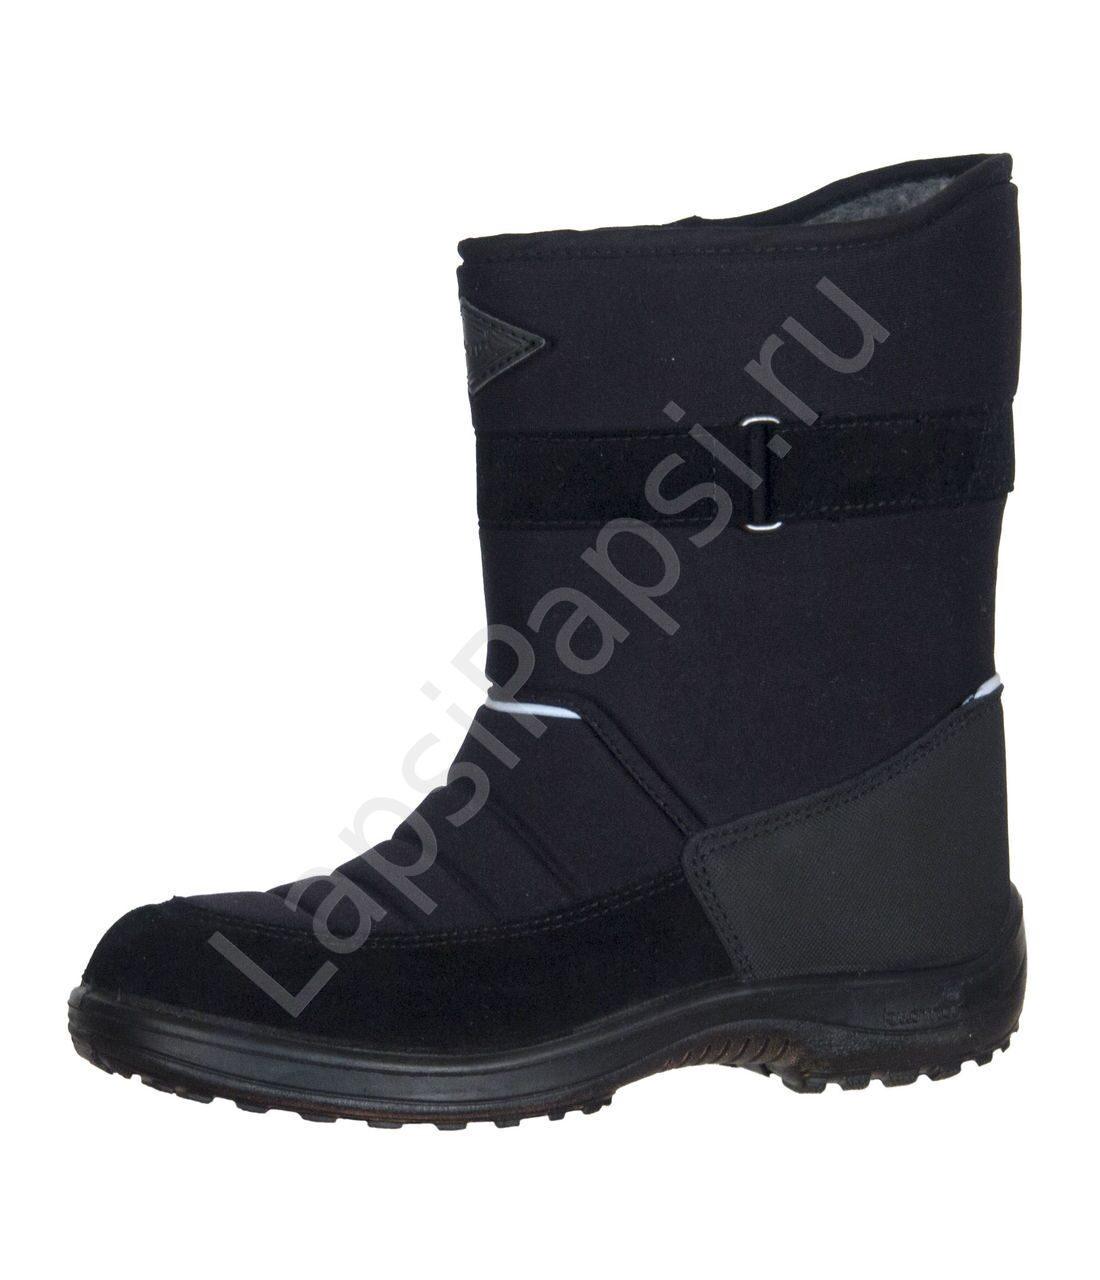 Обувь Kuoma – ноги всегда в тепле